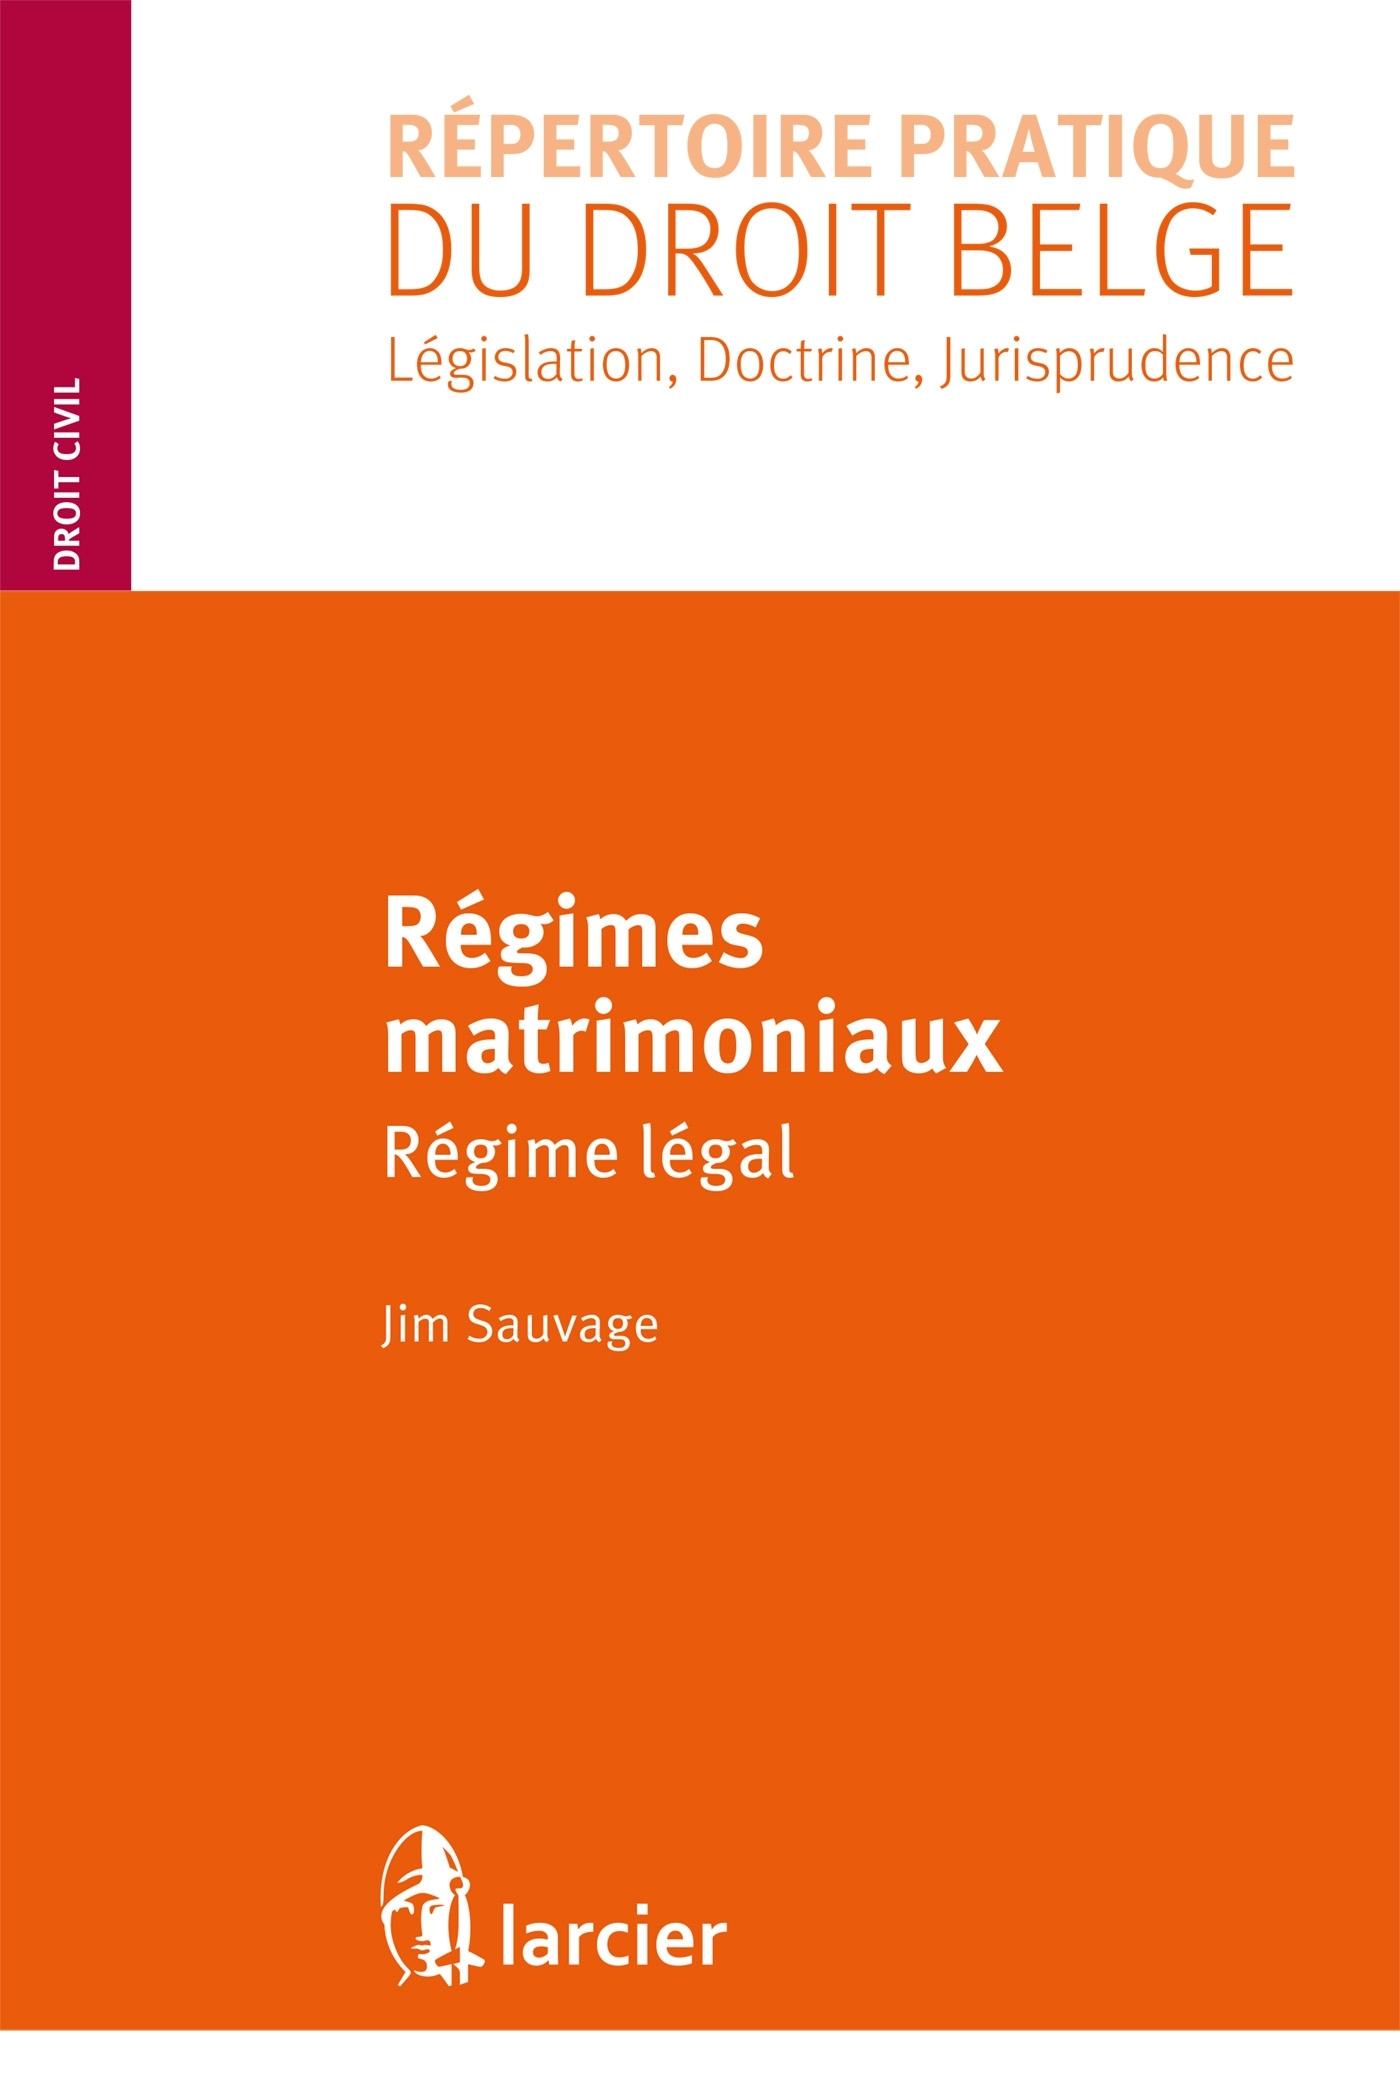 REGIMES MATRIMONIAUX - REGIME LEGAL